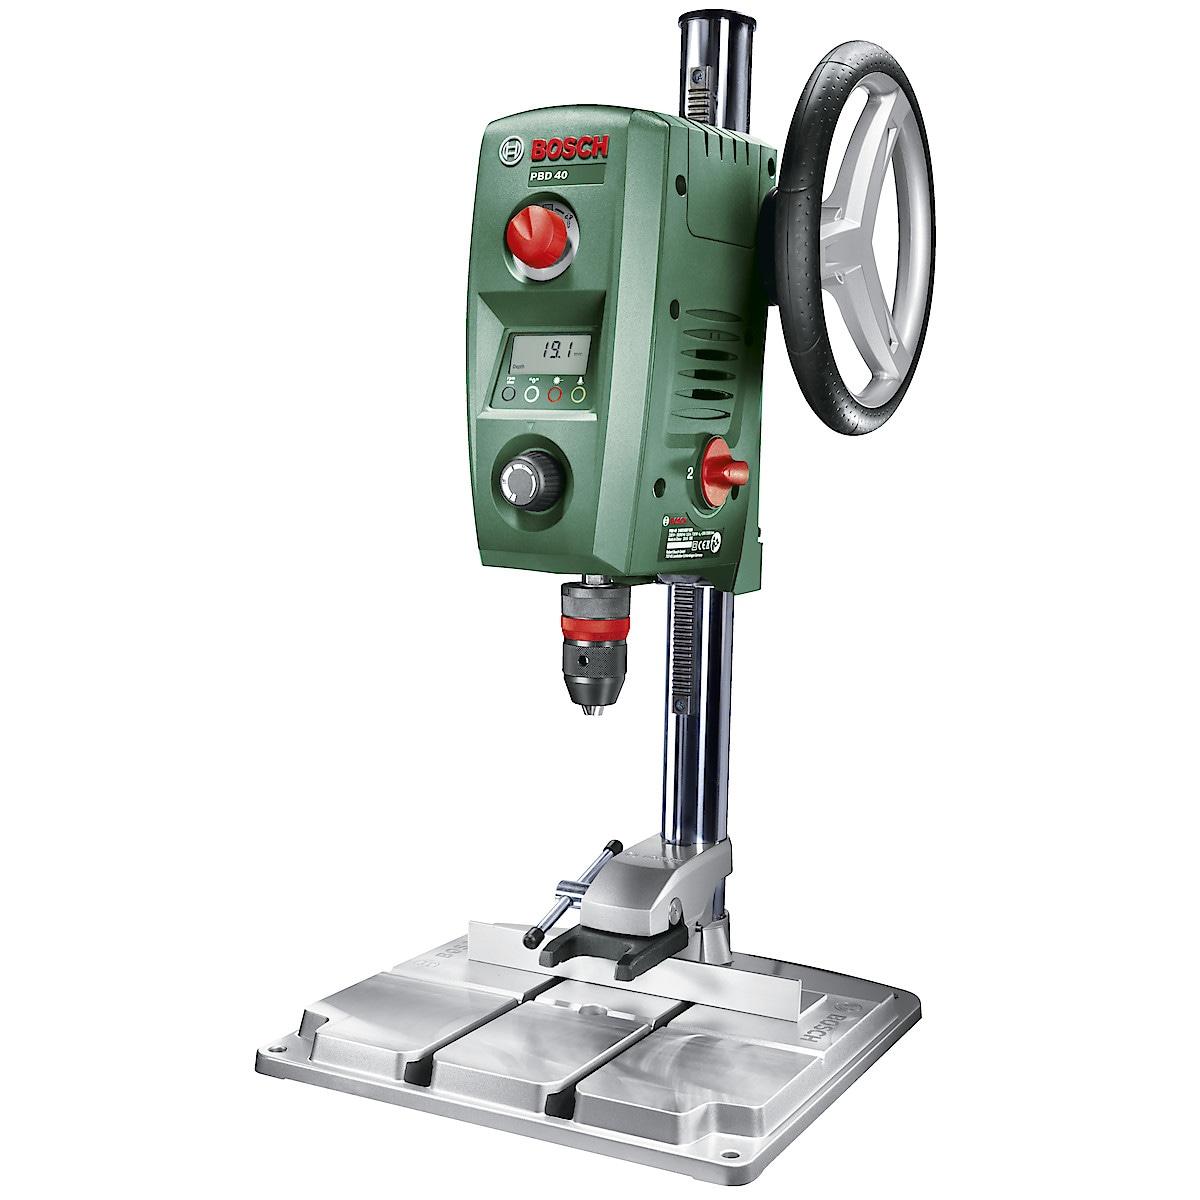 Pylväsporakone Bosch PBD 40